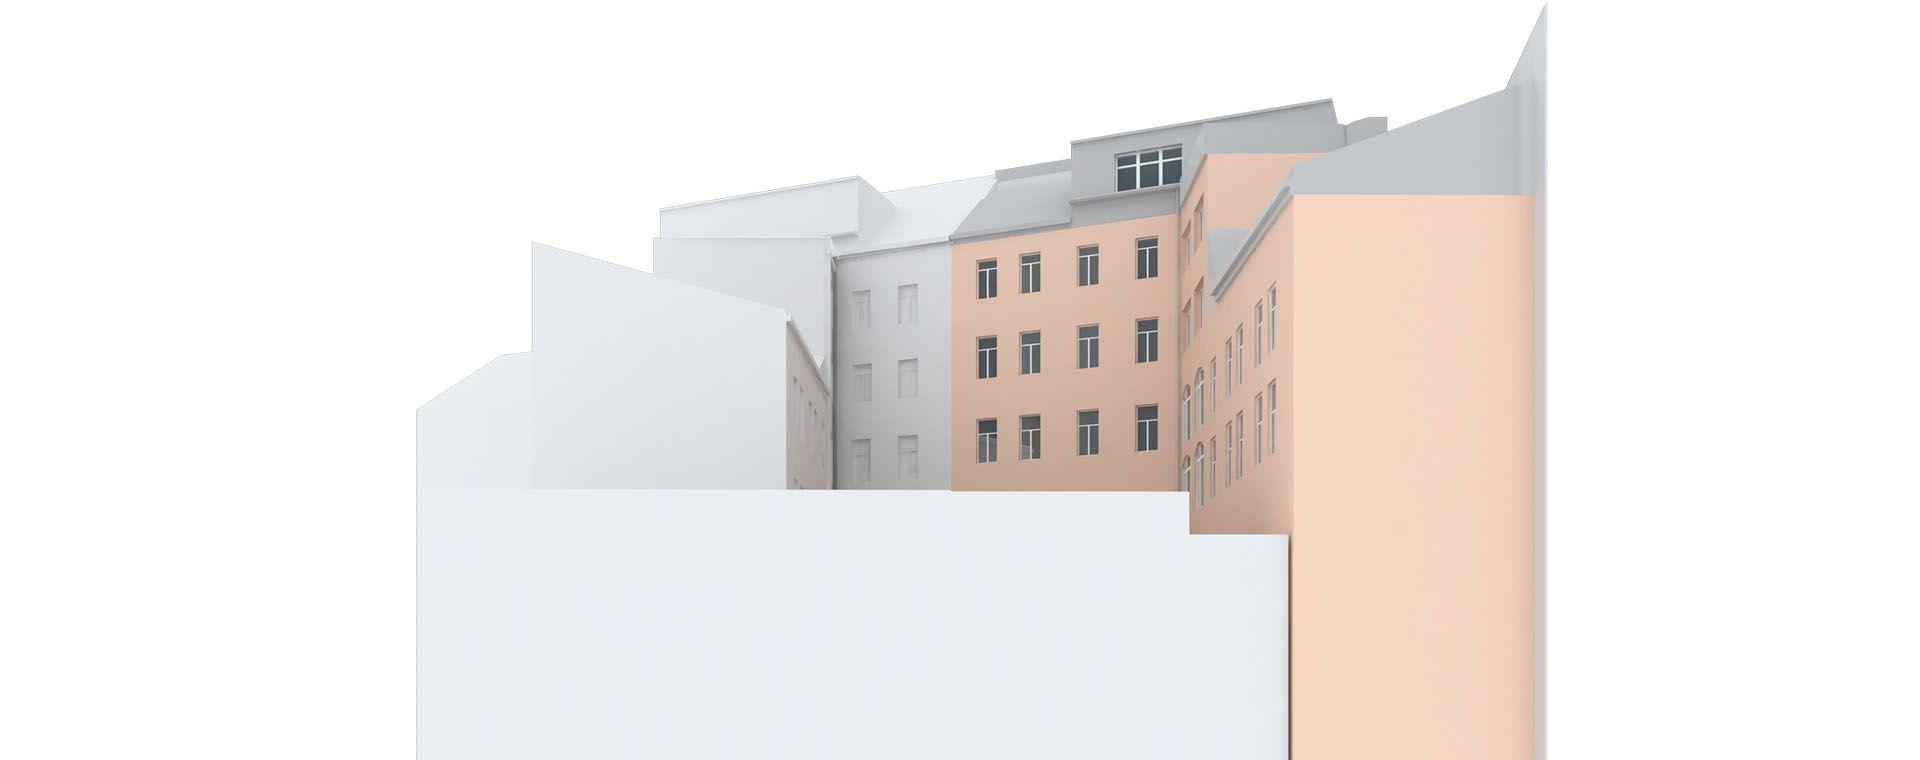 Attic adaptation of the roof to apartment to get duplex/maisonette/mezenet, Milady Horakove, Prague, 2014, CZ